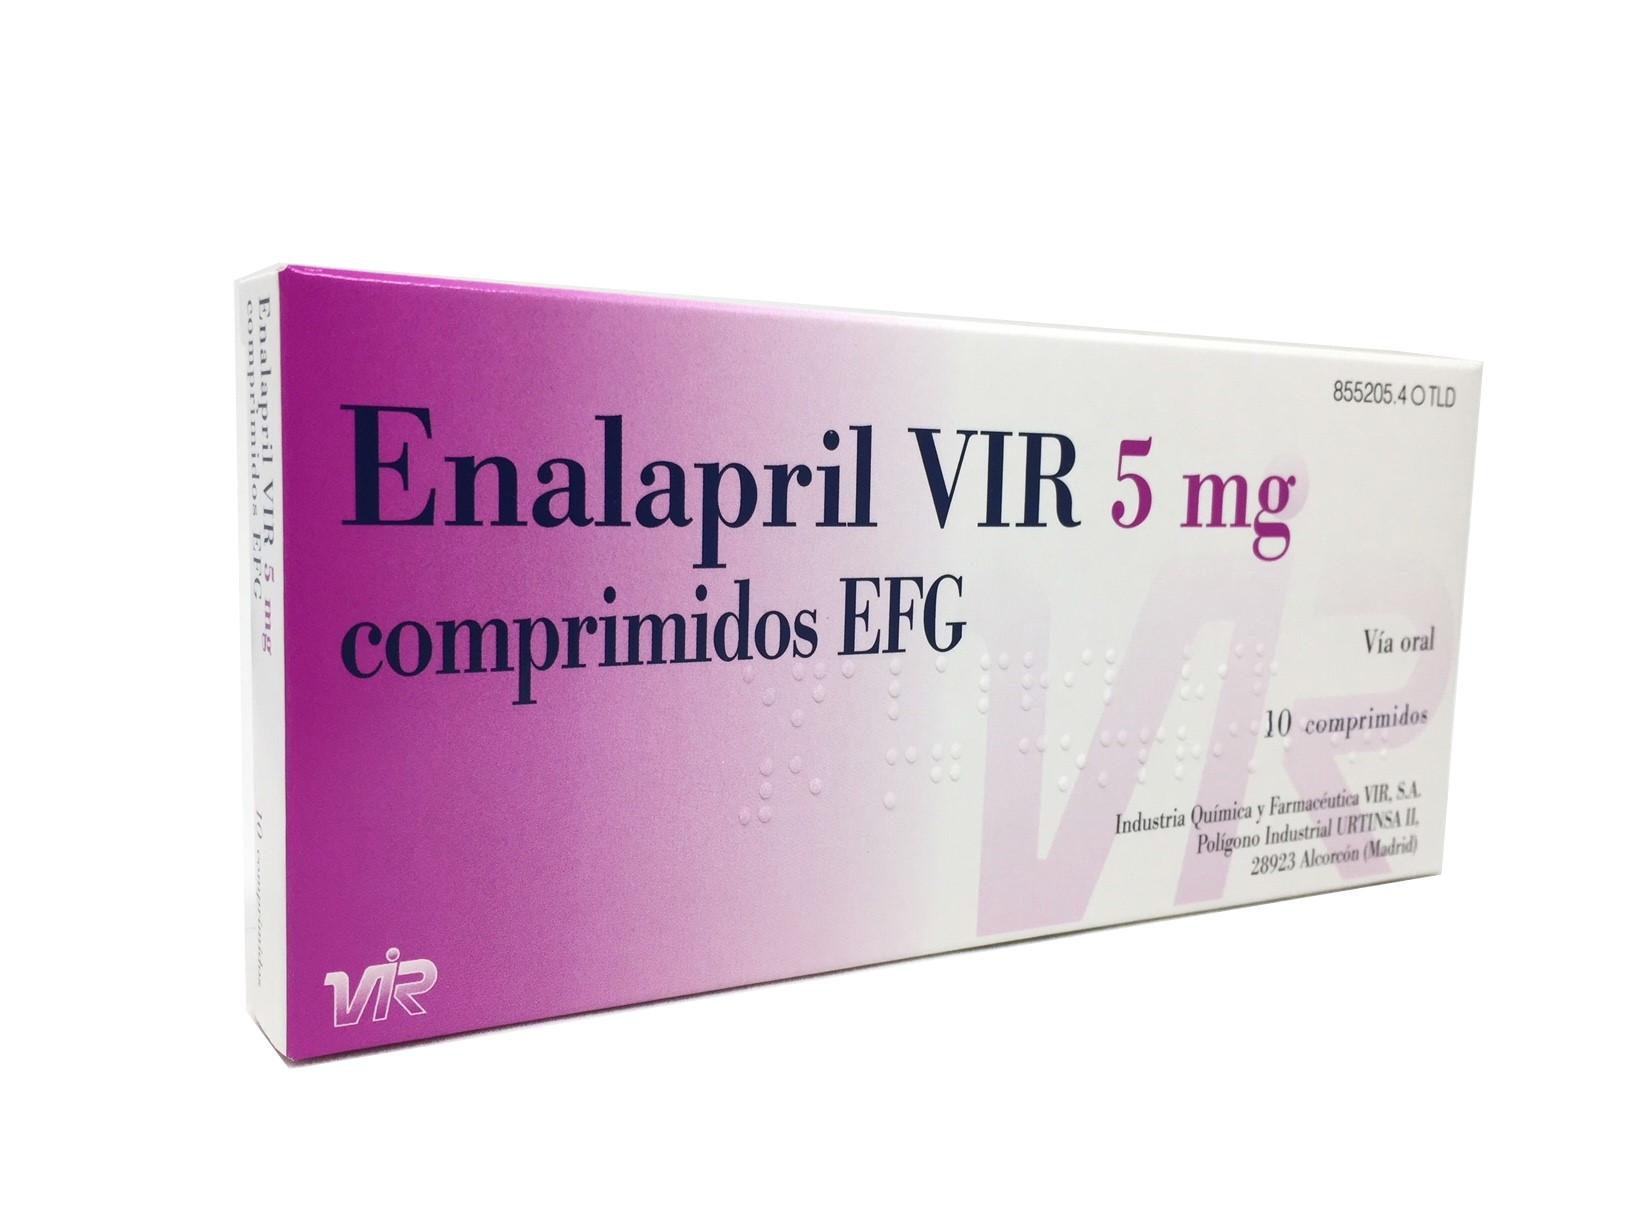 Enalapril nx generic medication